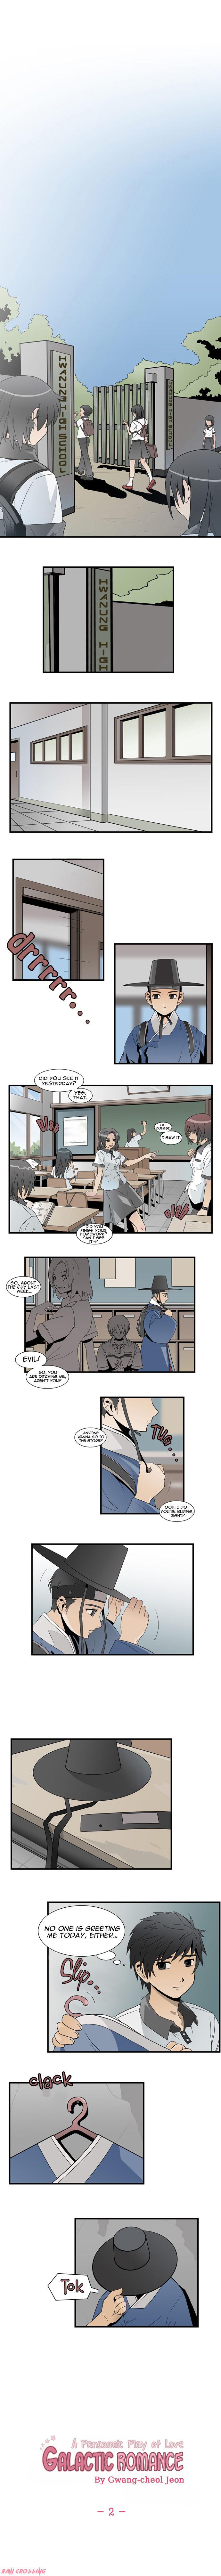 Galactic Romance 2 Page 2